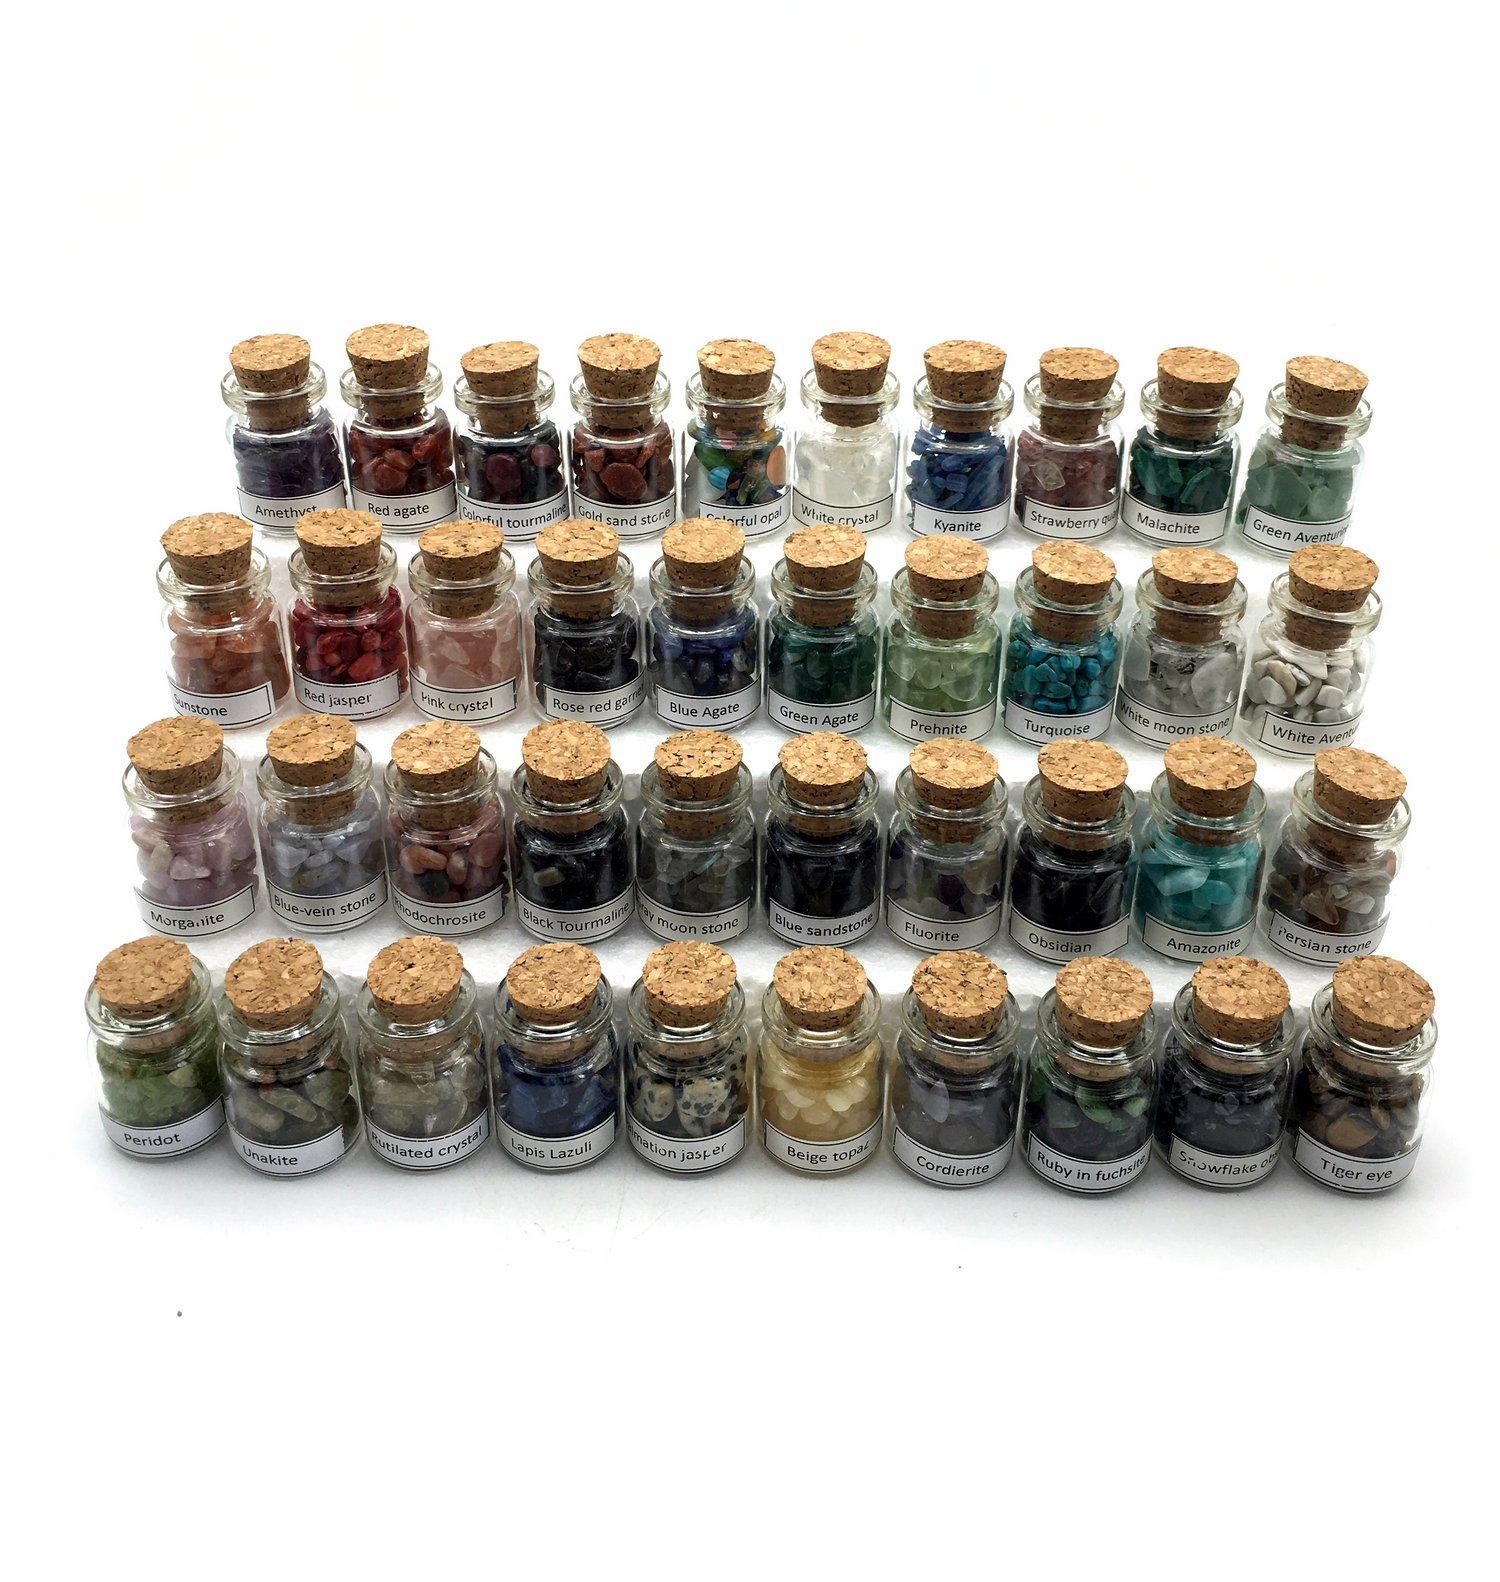 Shangbo 40Mini Gemstone Bottles Tumbled Stones Healing Crystal Reiki Crystal Wishing Bottle Gift. by Shangbo